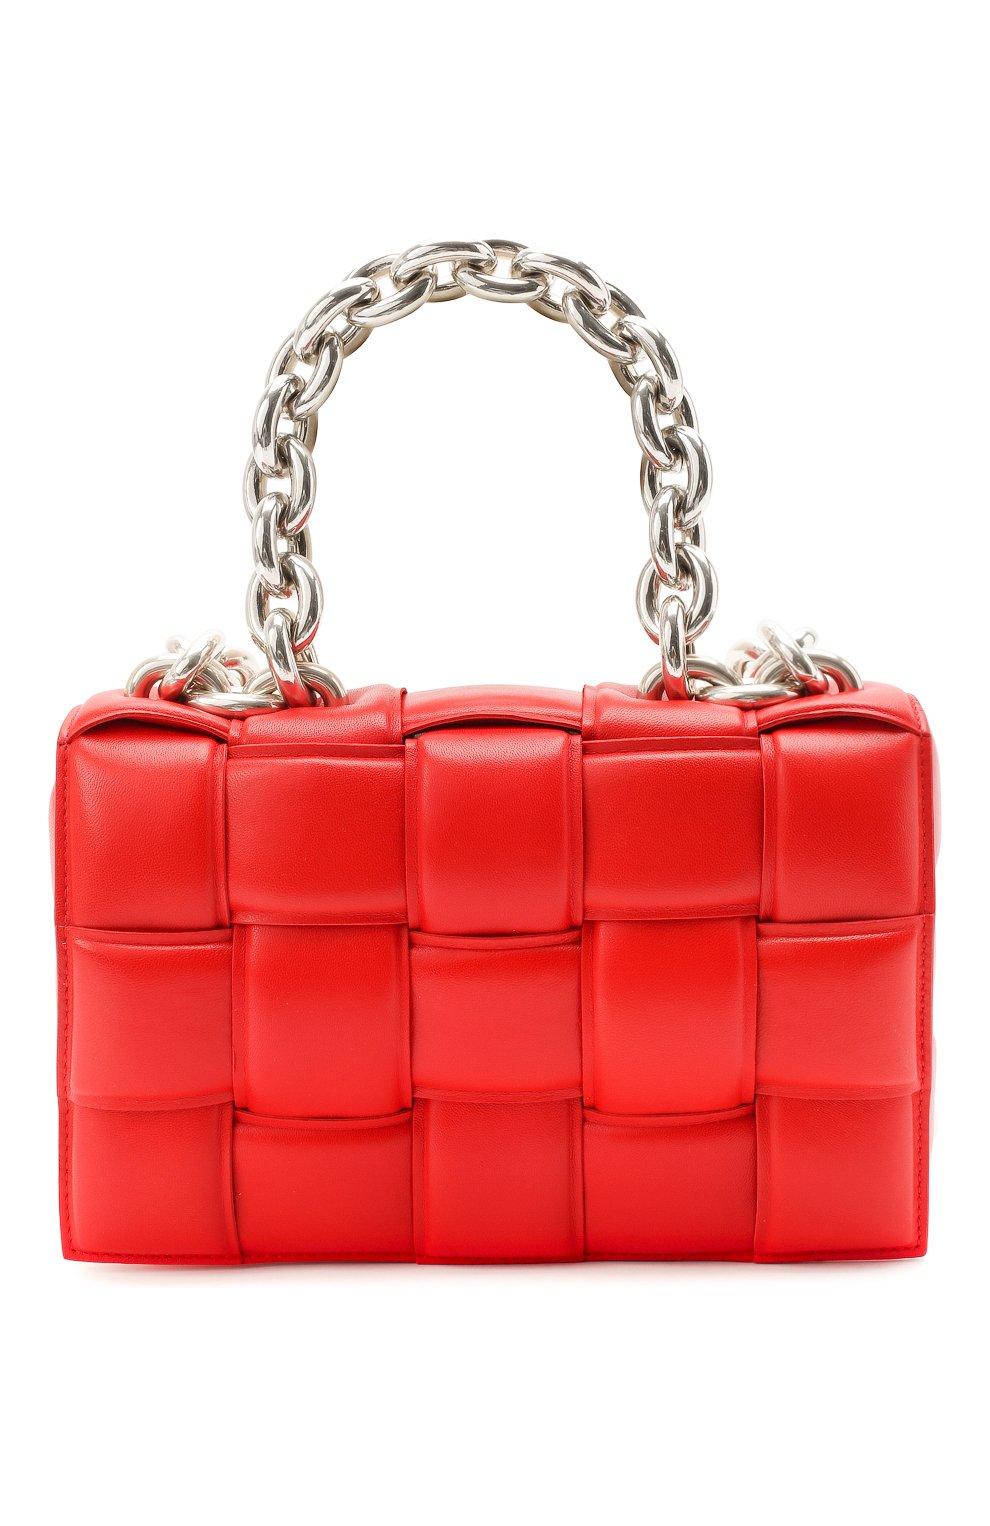 Женская сумка chain cassette BOTTEGA VENETA красного цвета, арт. 631421/VBWZ0   Фото 1